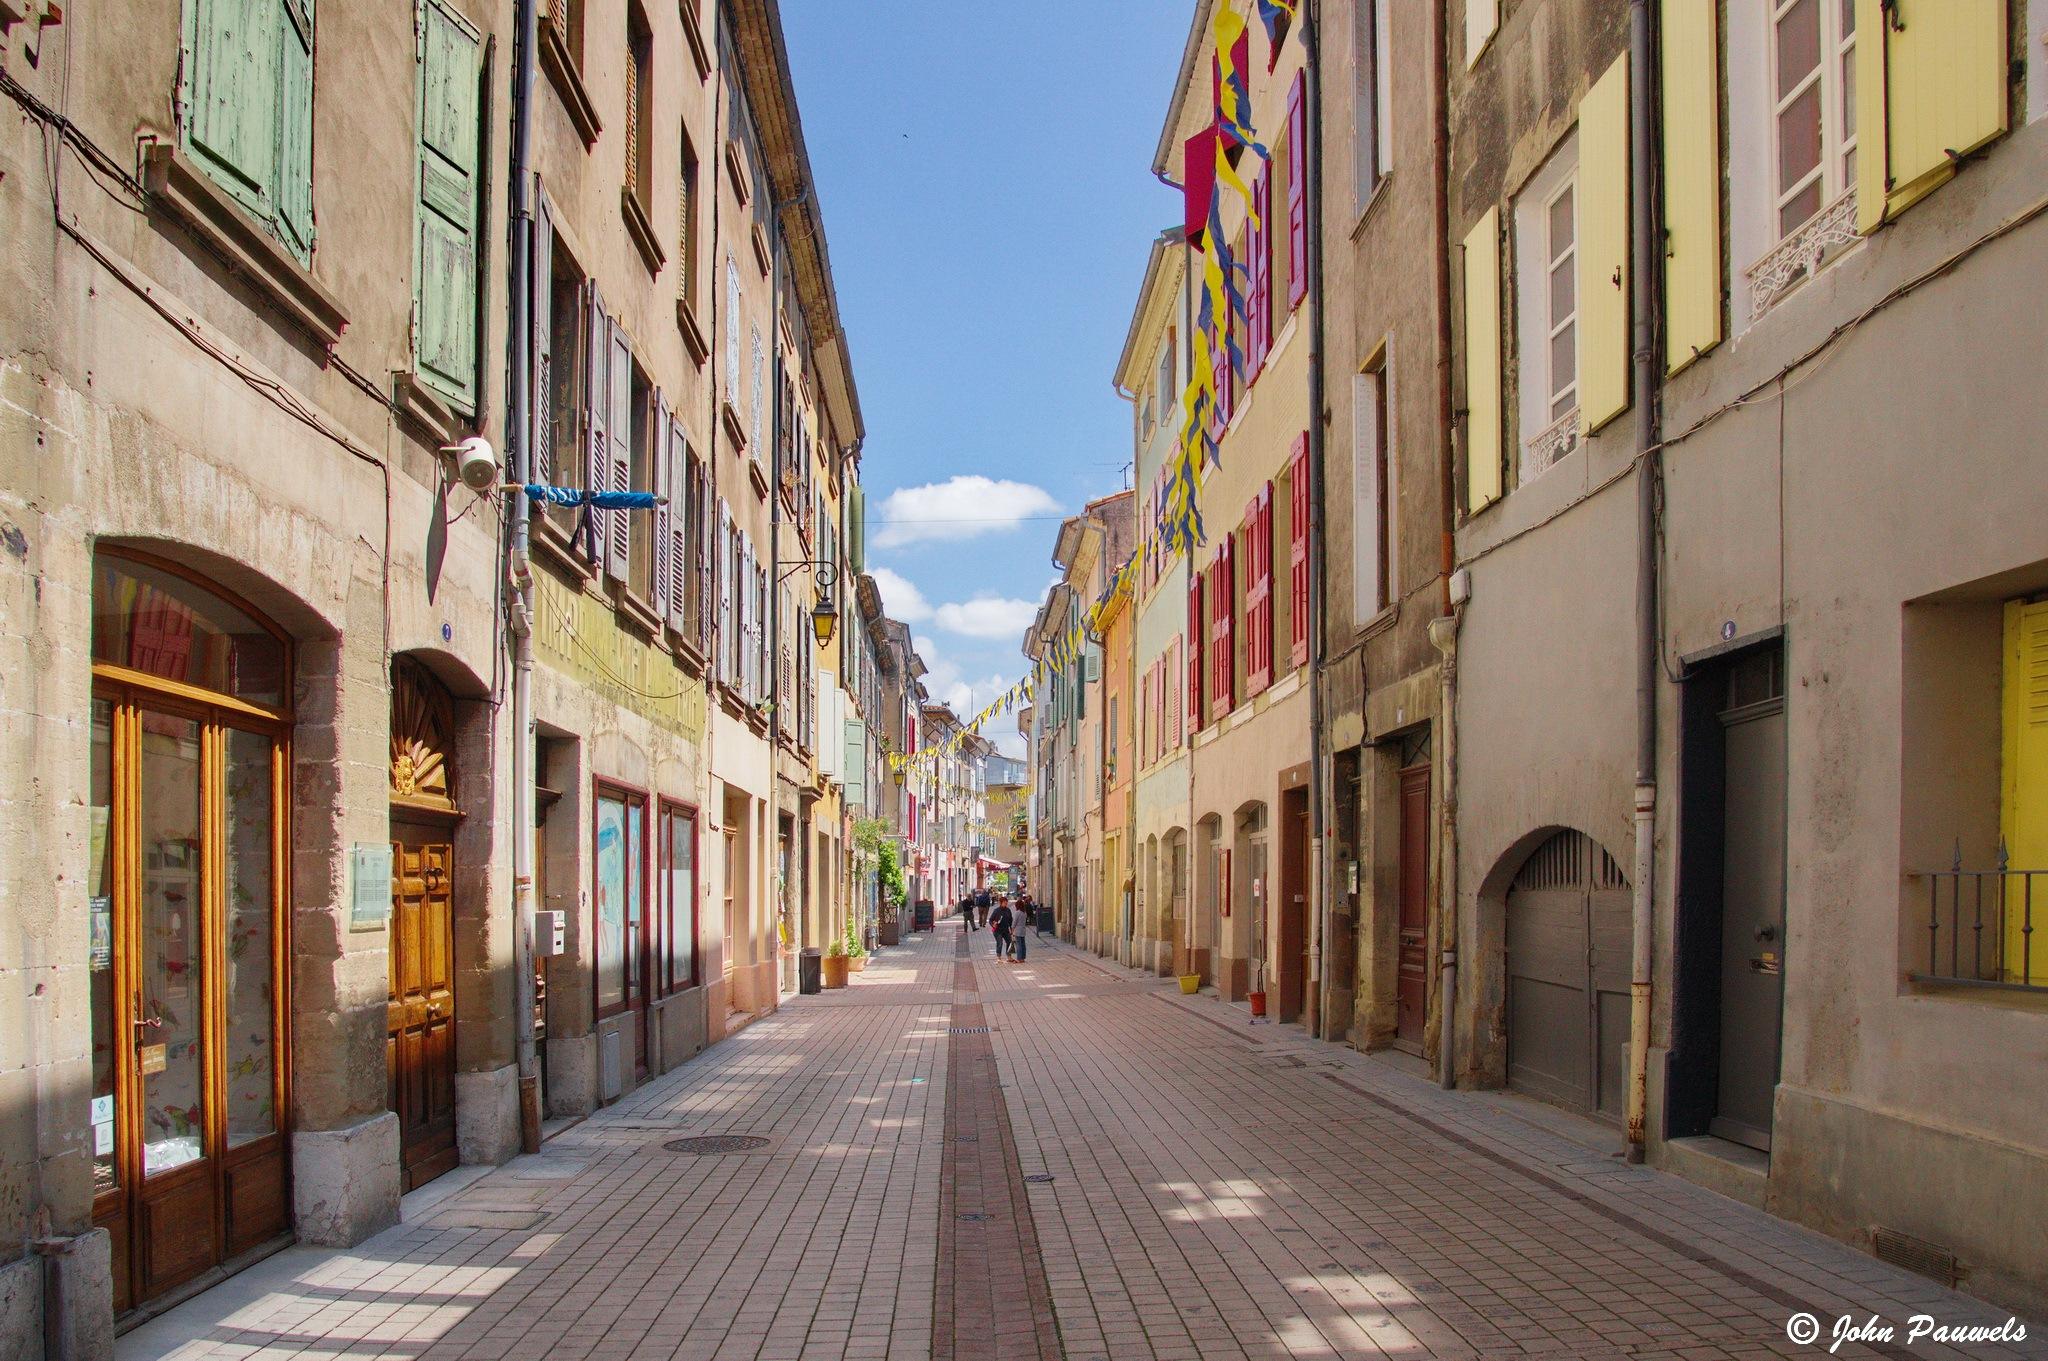 Colorful street. by John Pauwels